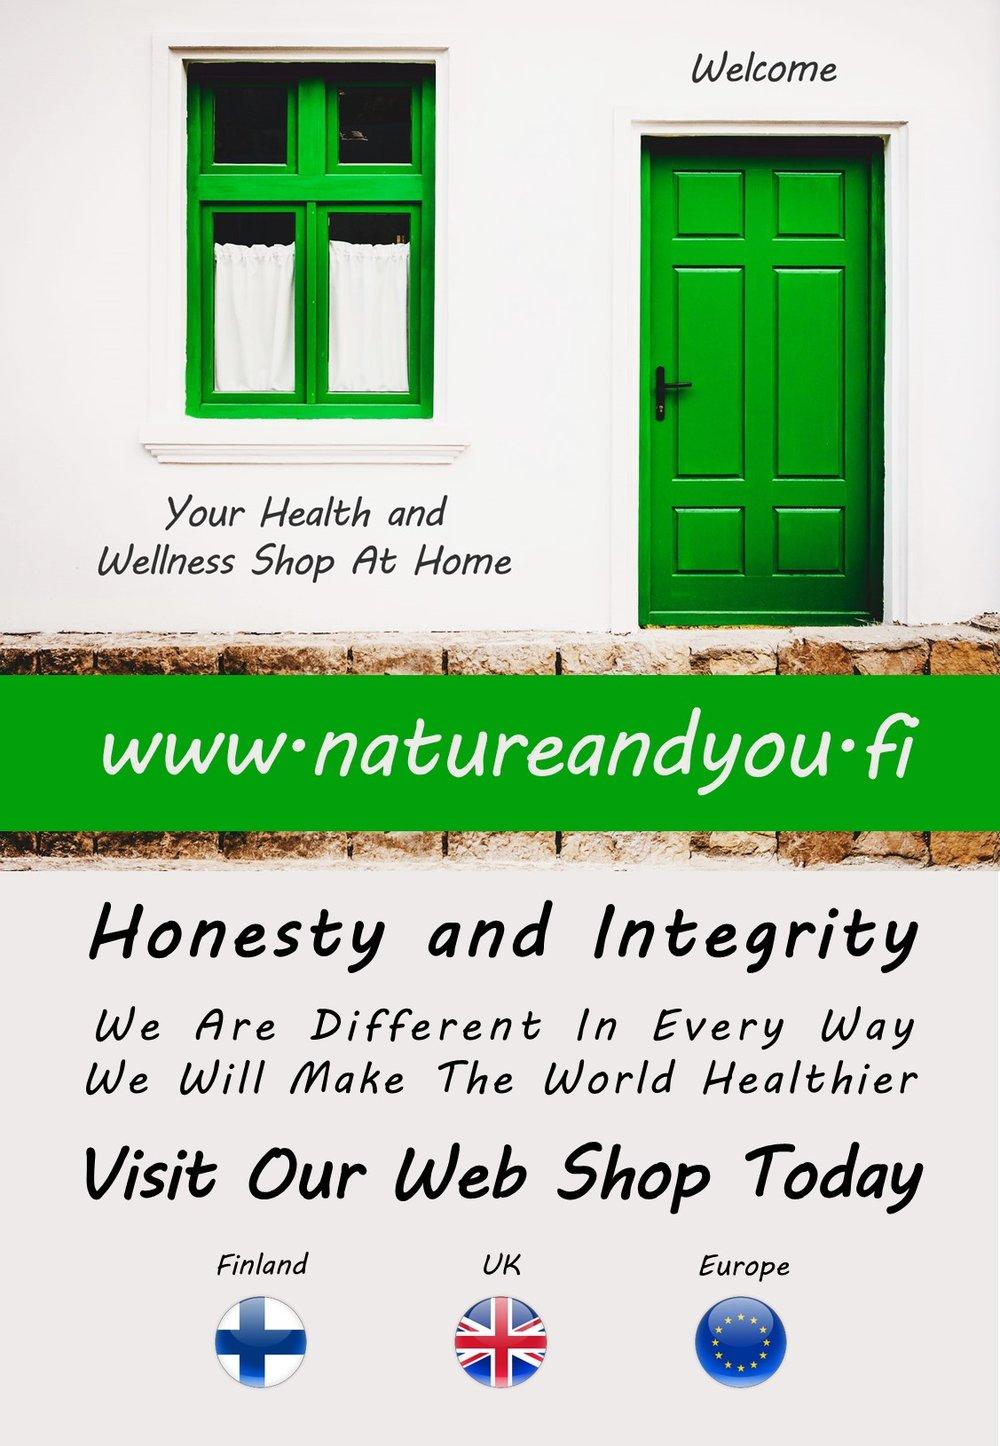 Web-Shop_Launch.jpg